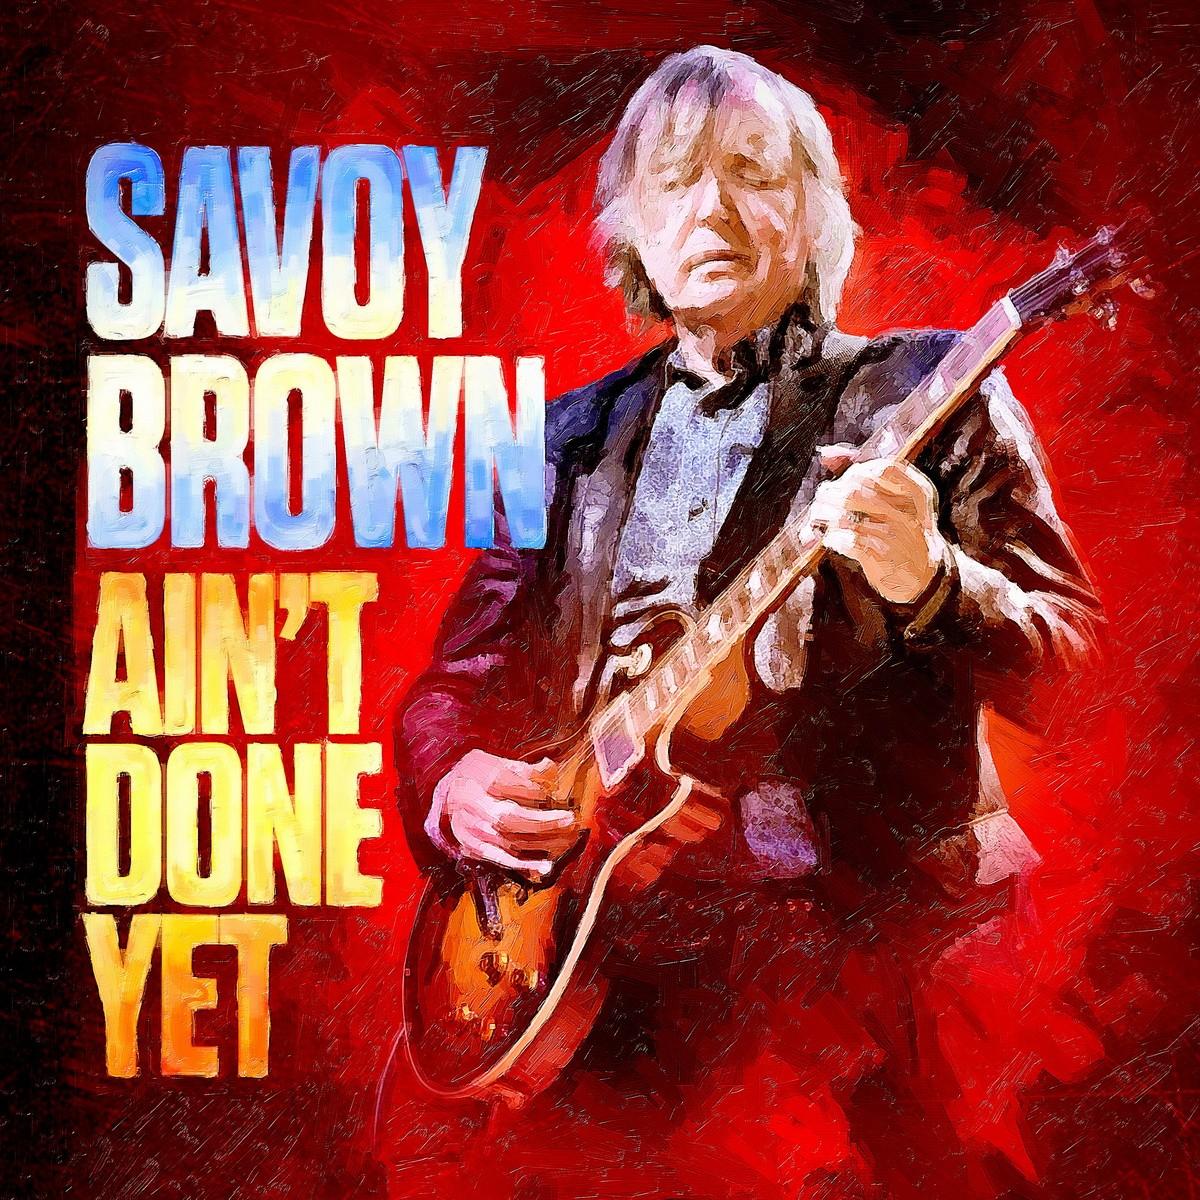 Savoy-Brown-Ain%u2019t-Done-Yet